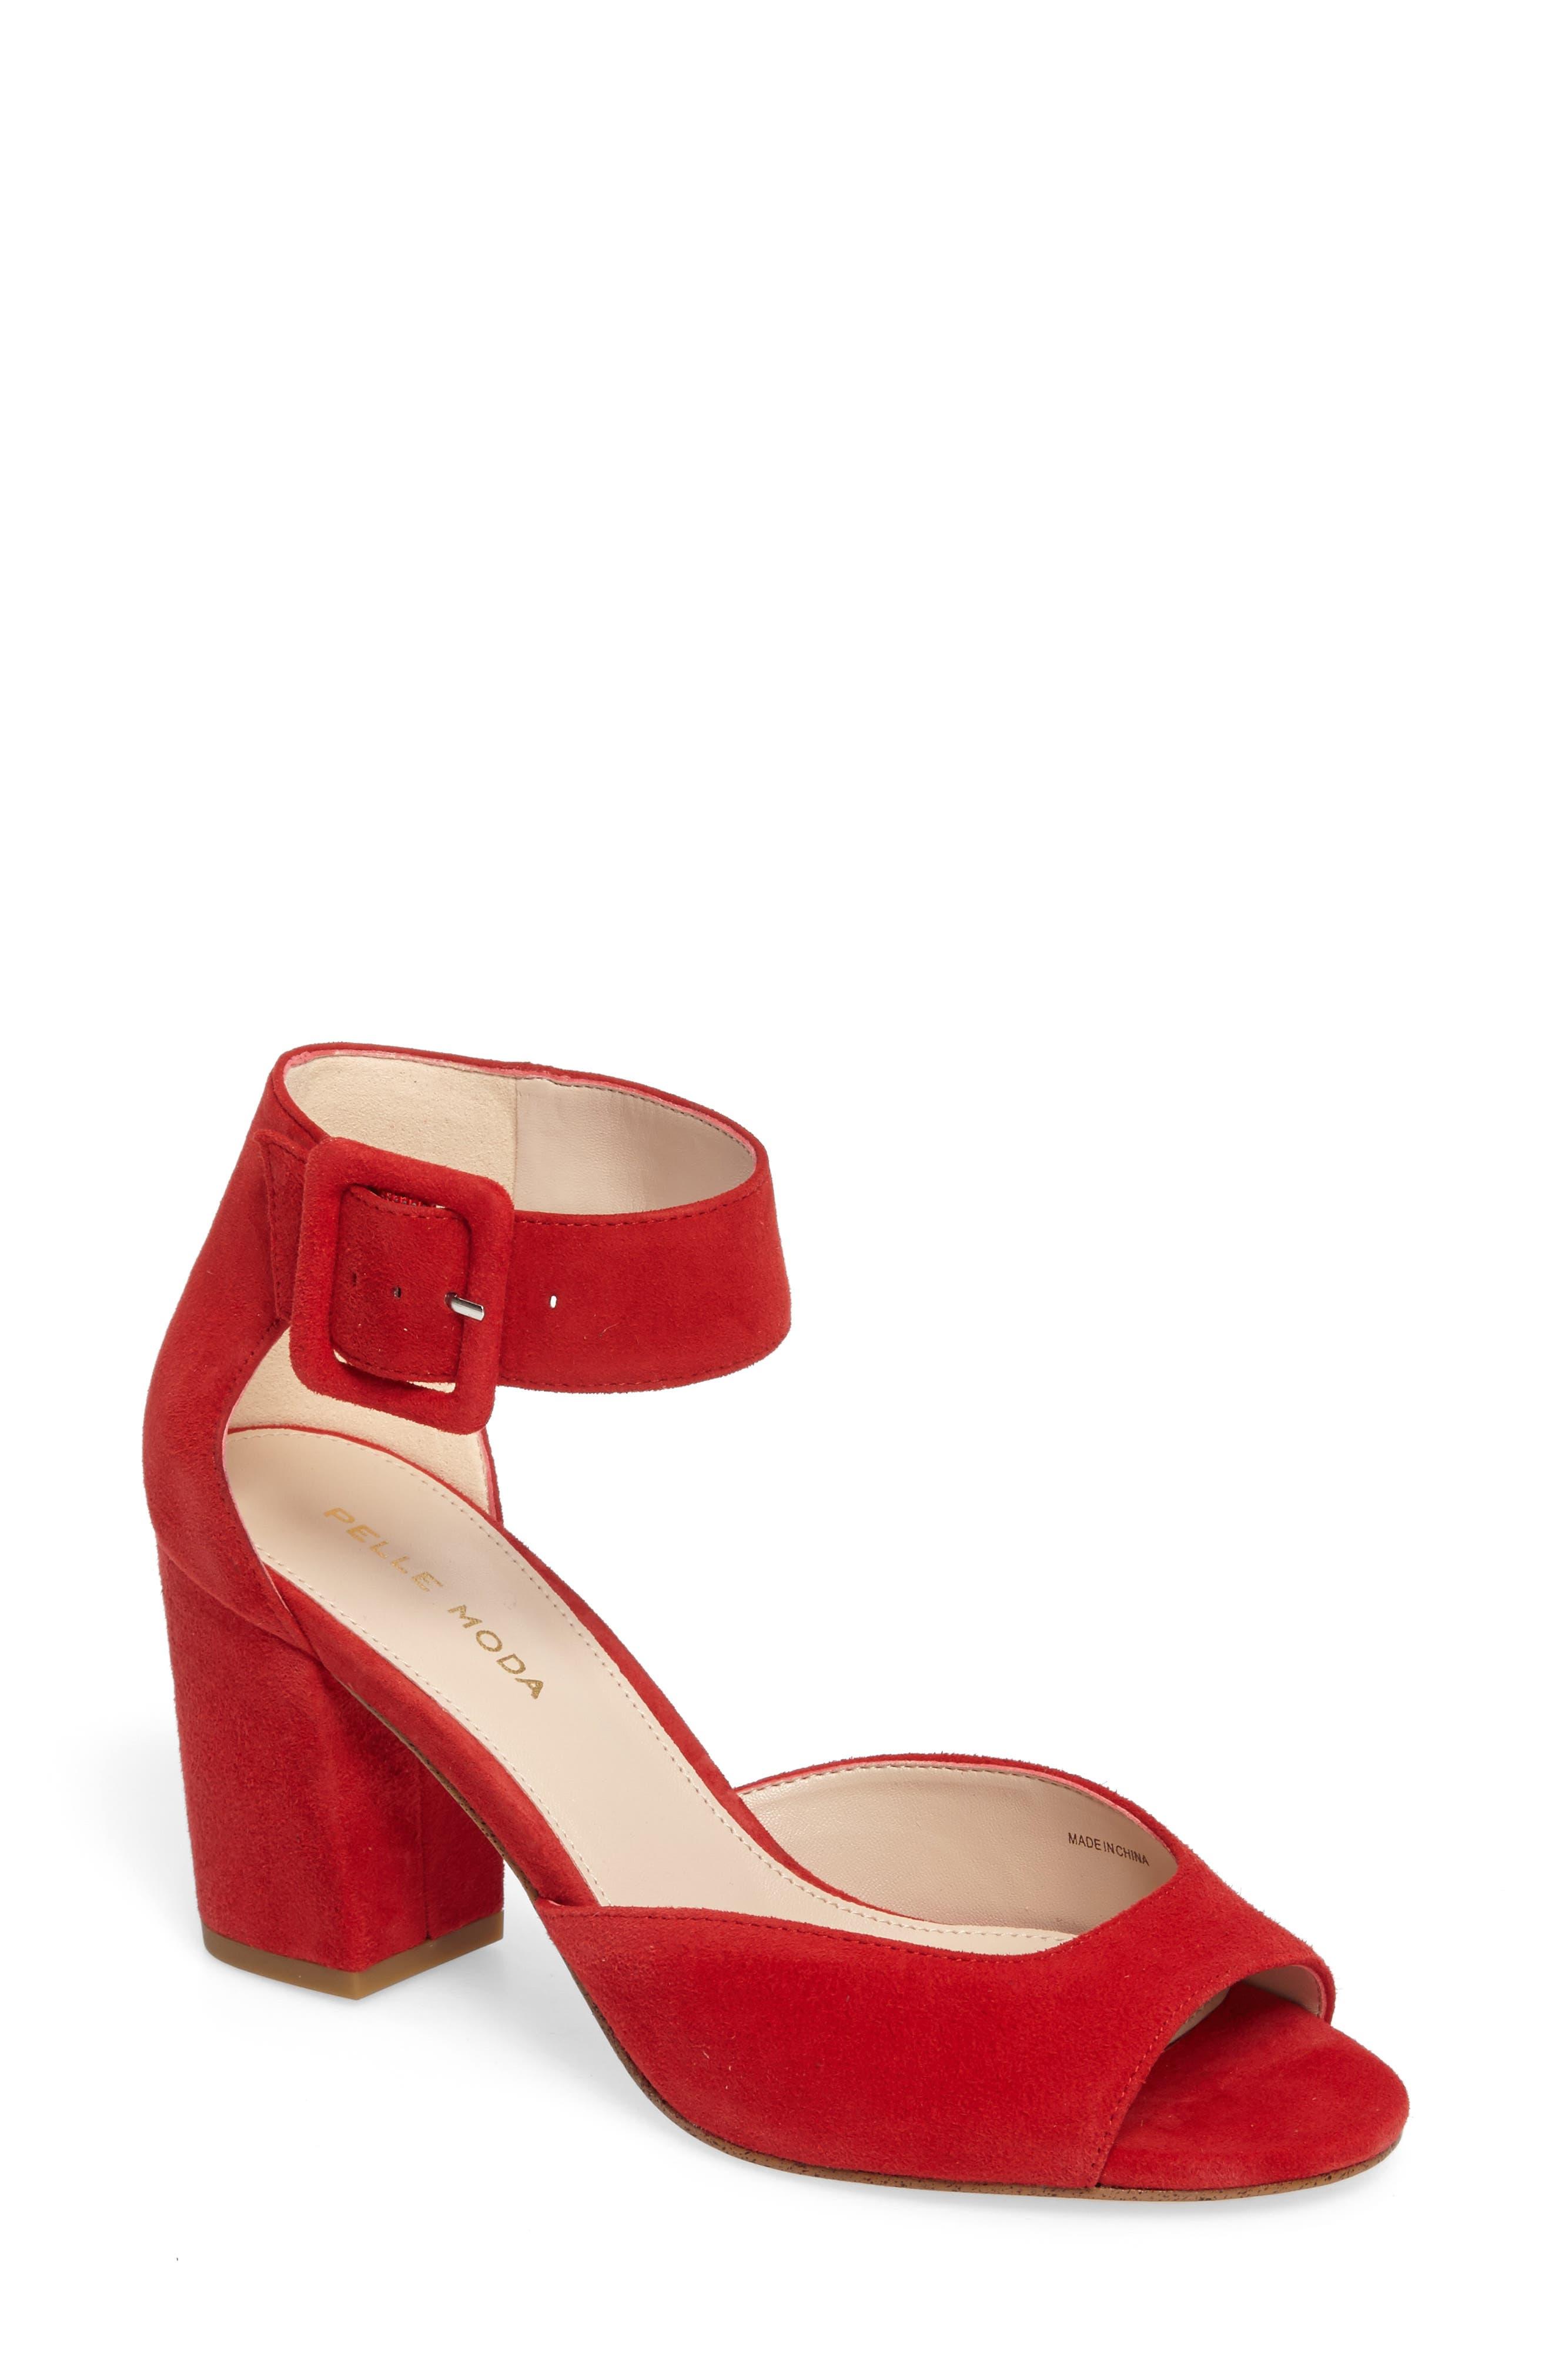 b729b6d6167d6 bijou shoes